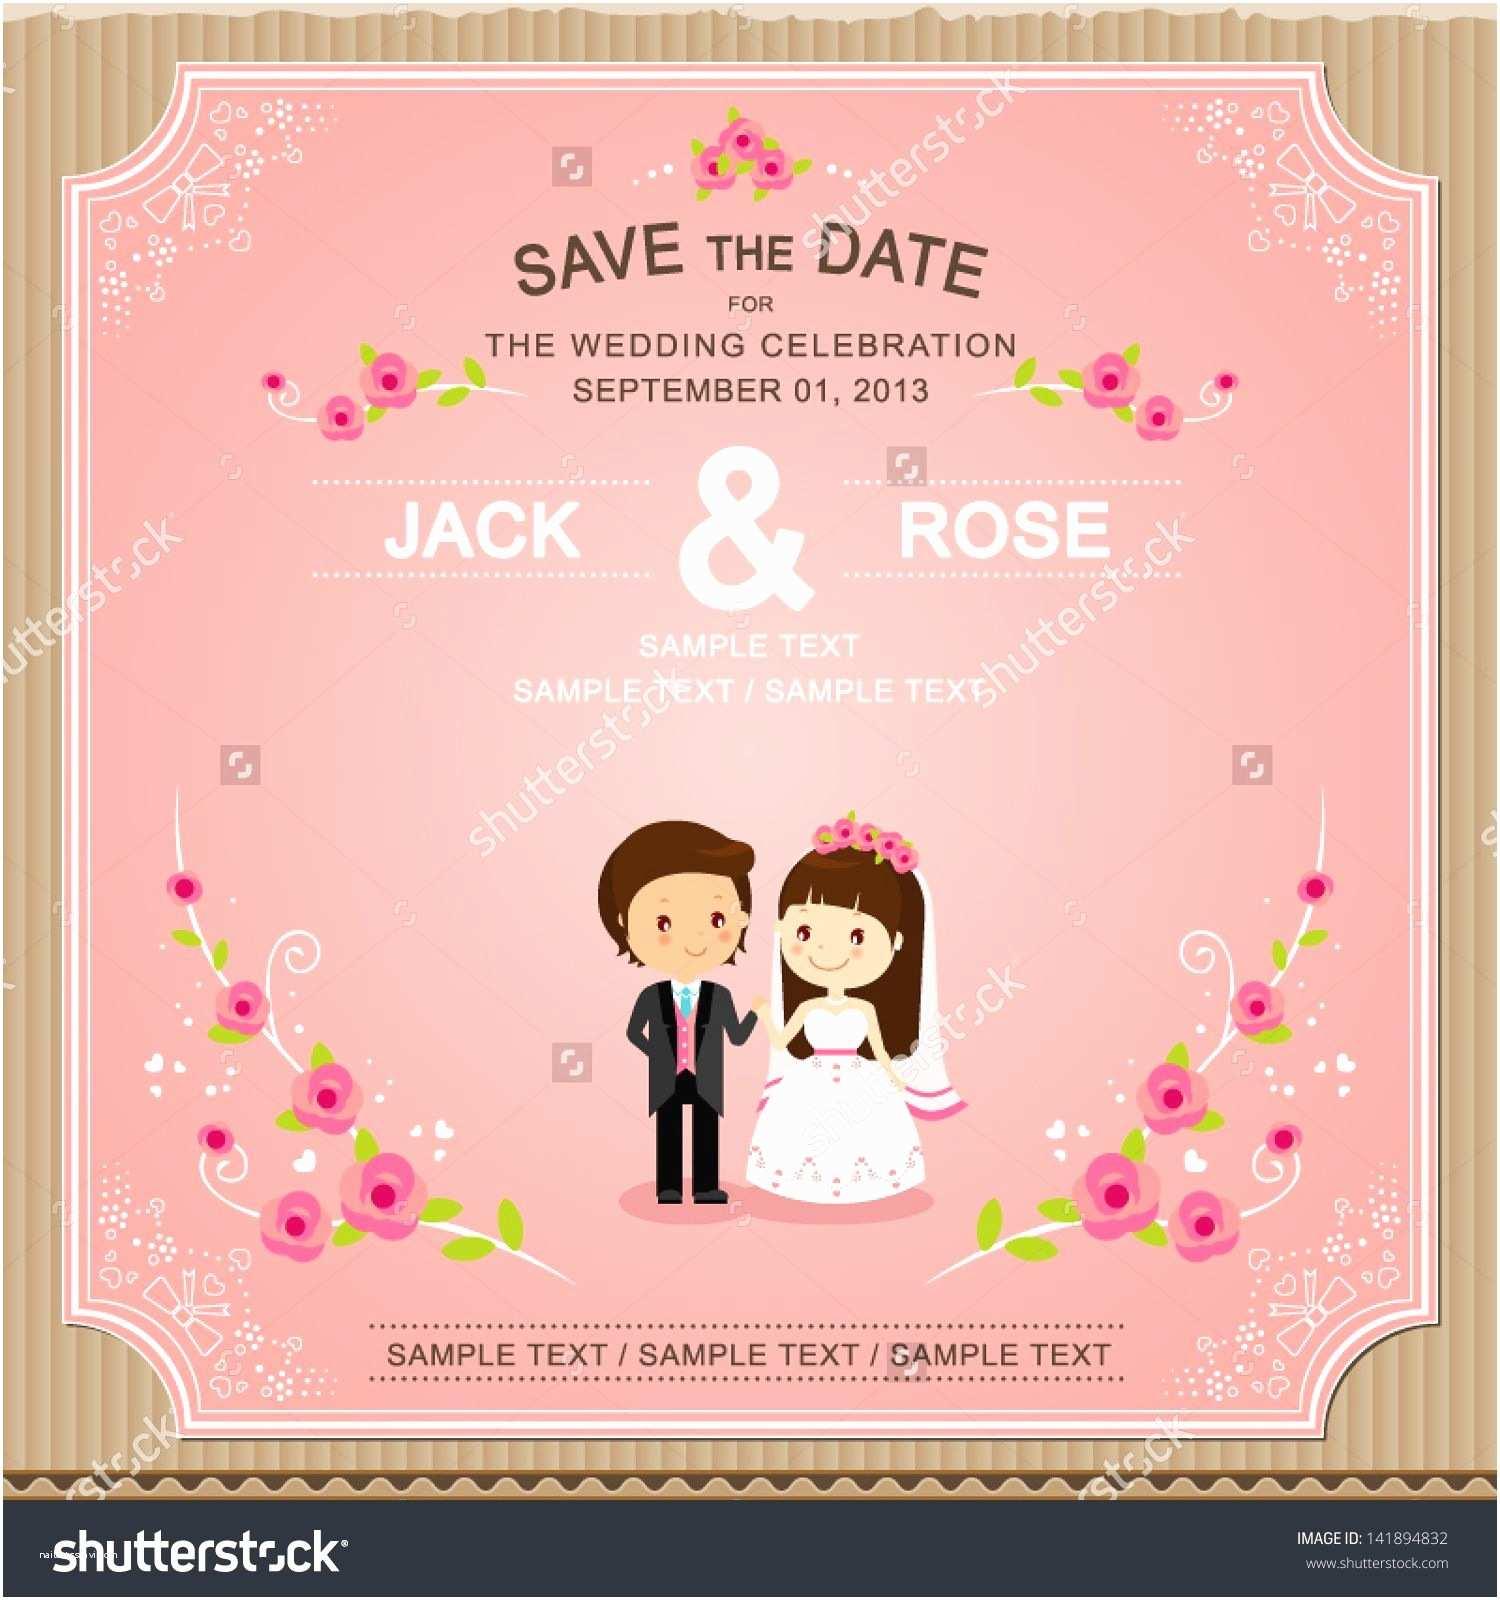 Editable Wedding Invitation Cards Free Download Wedding Invitation Card Template Editable